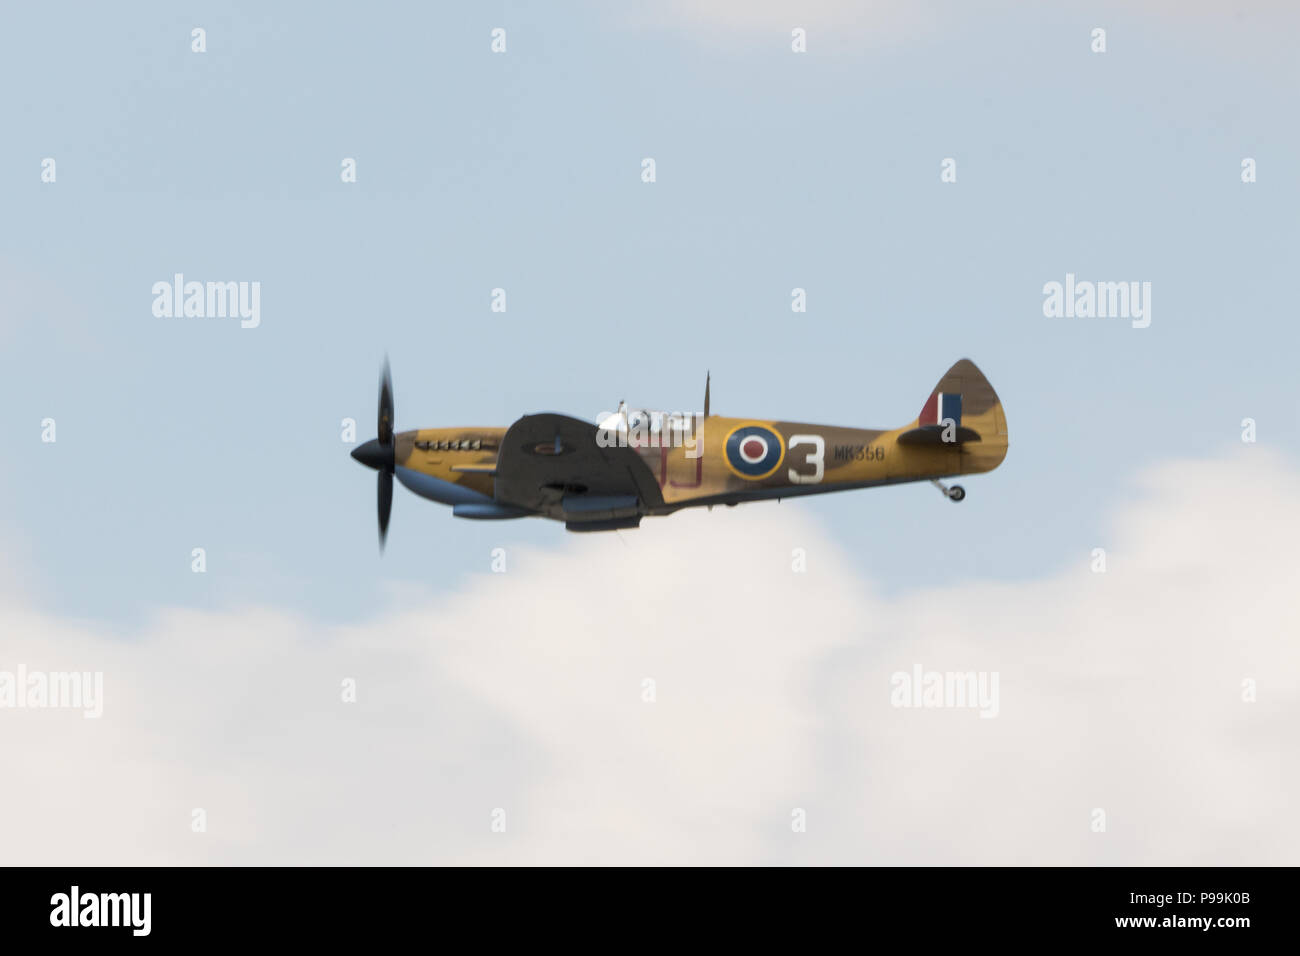 Supermarine spitfire at The Royal International Air Tattoo at RAF Fairford, England. Stock Photo